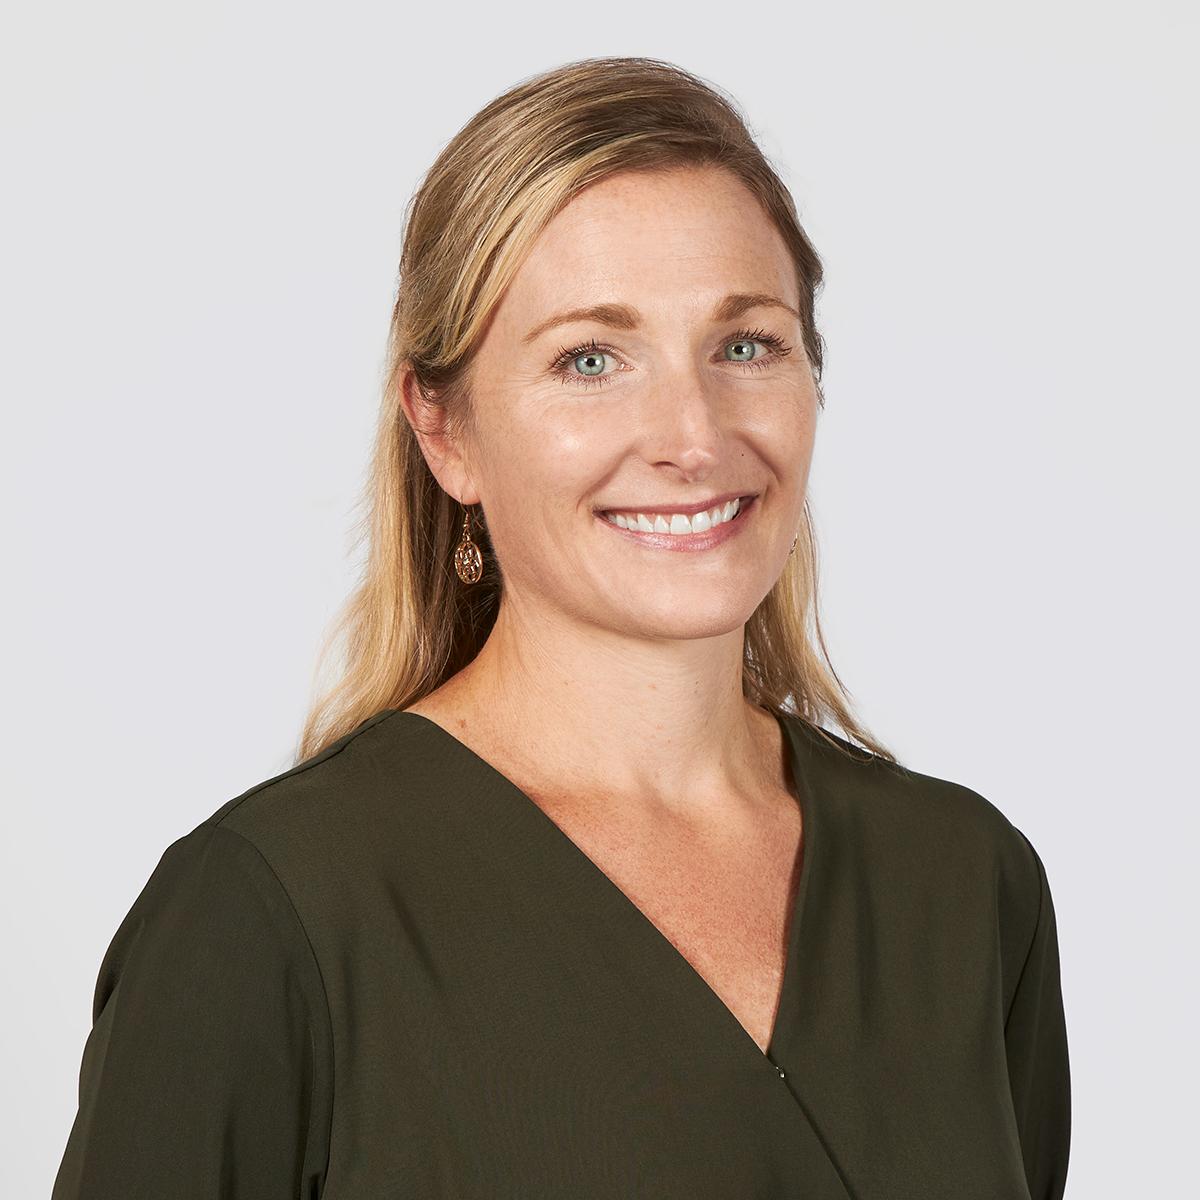 Amanda Mitchell